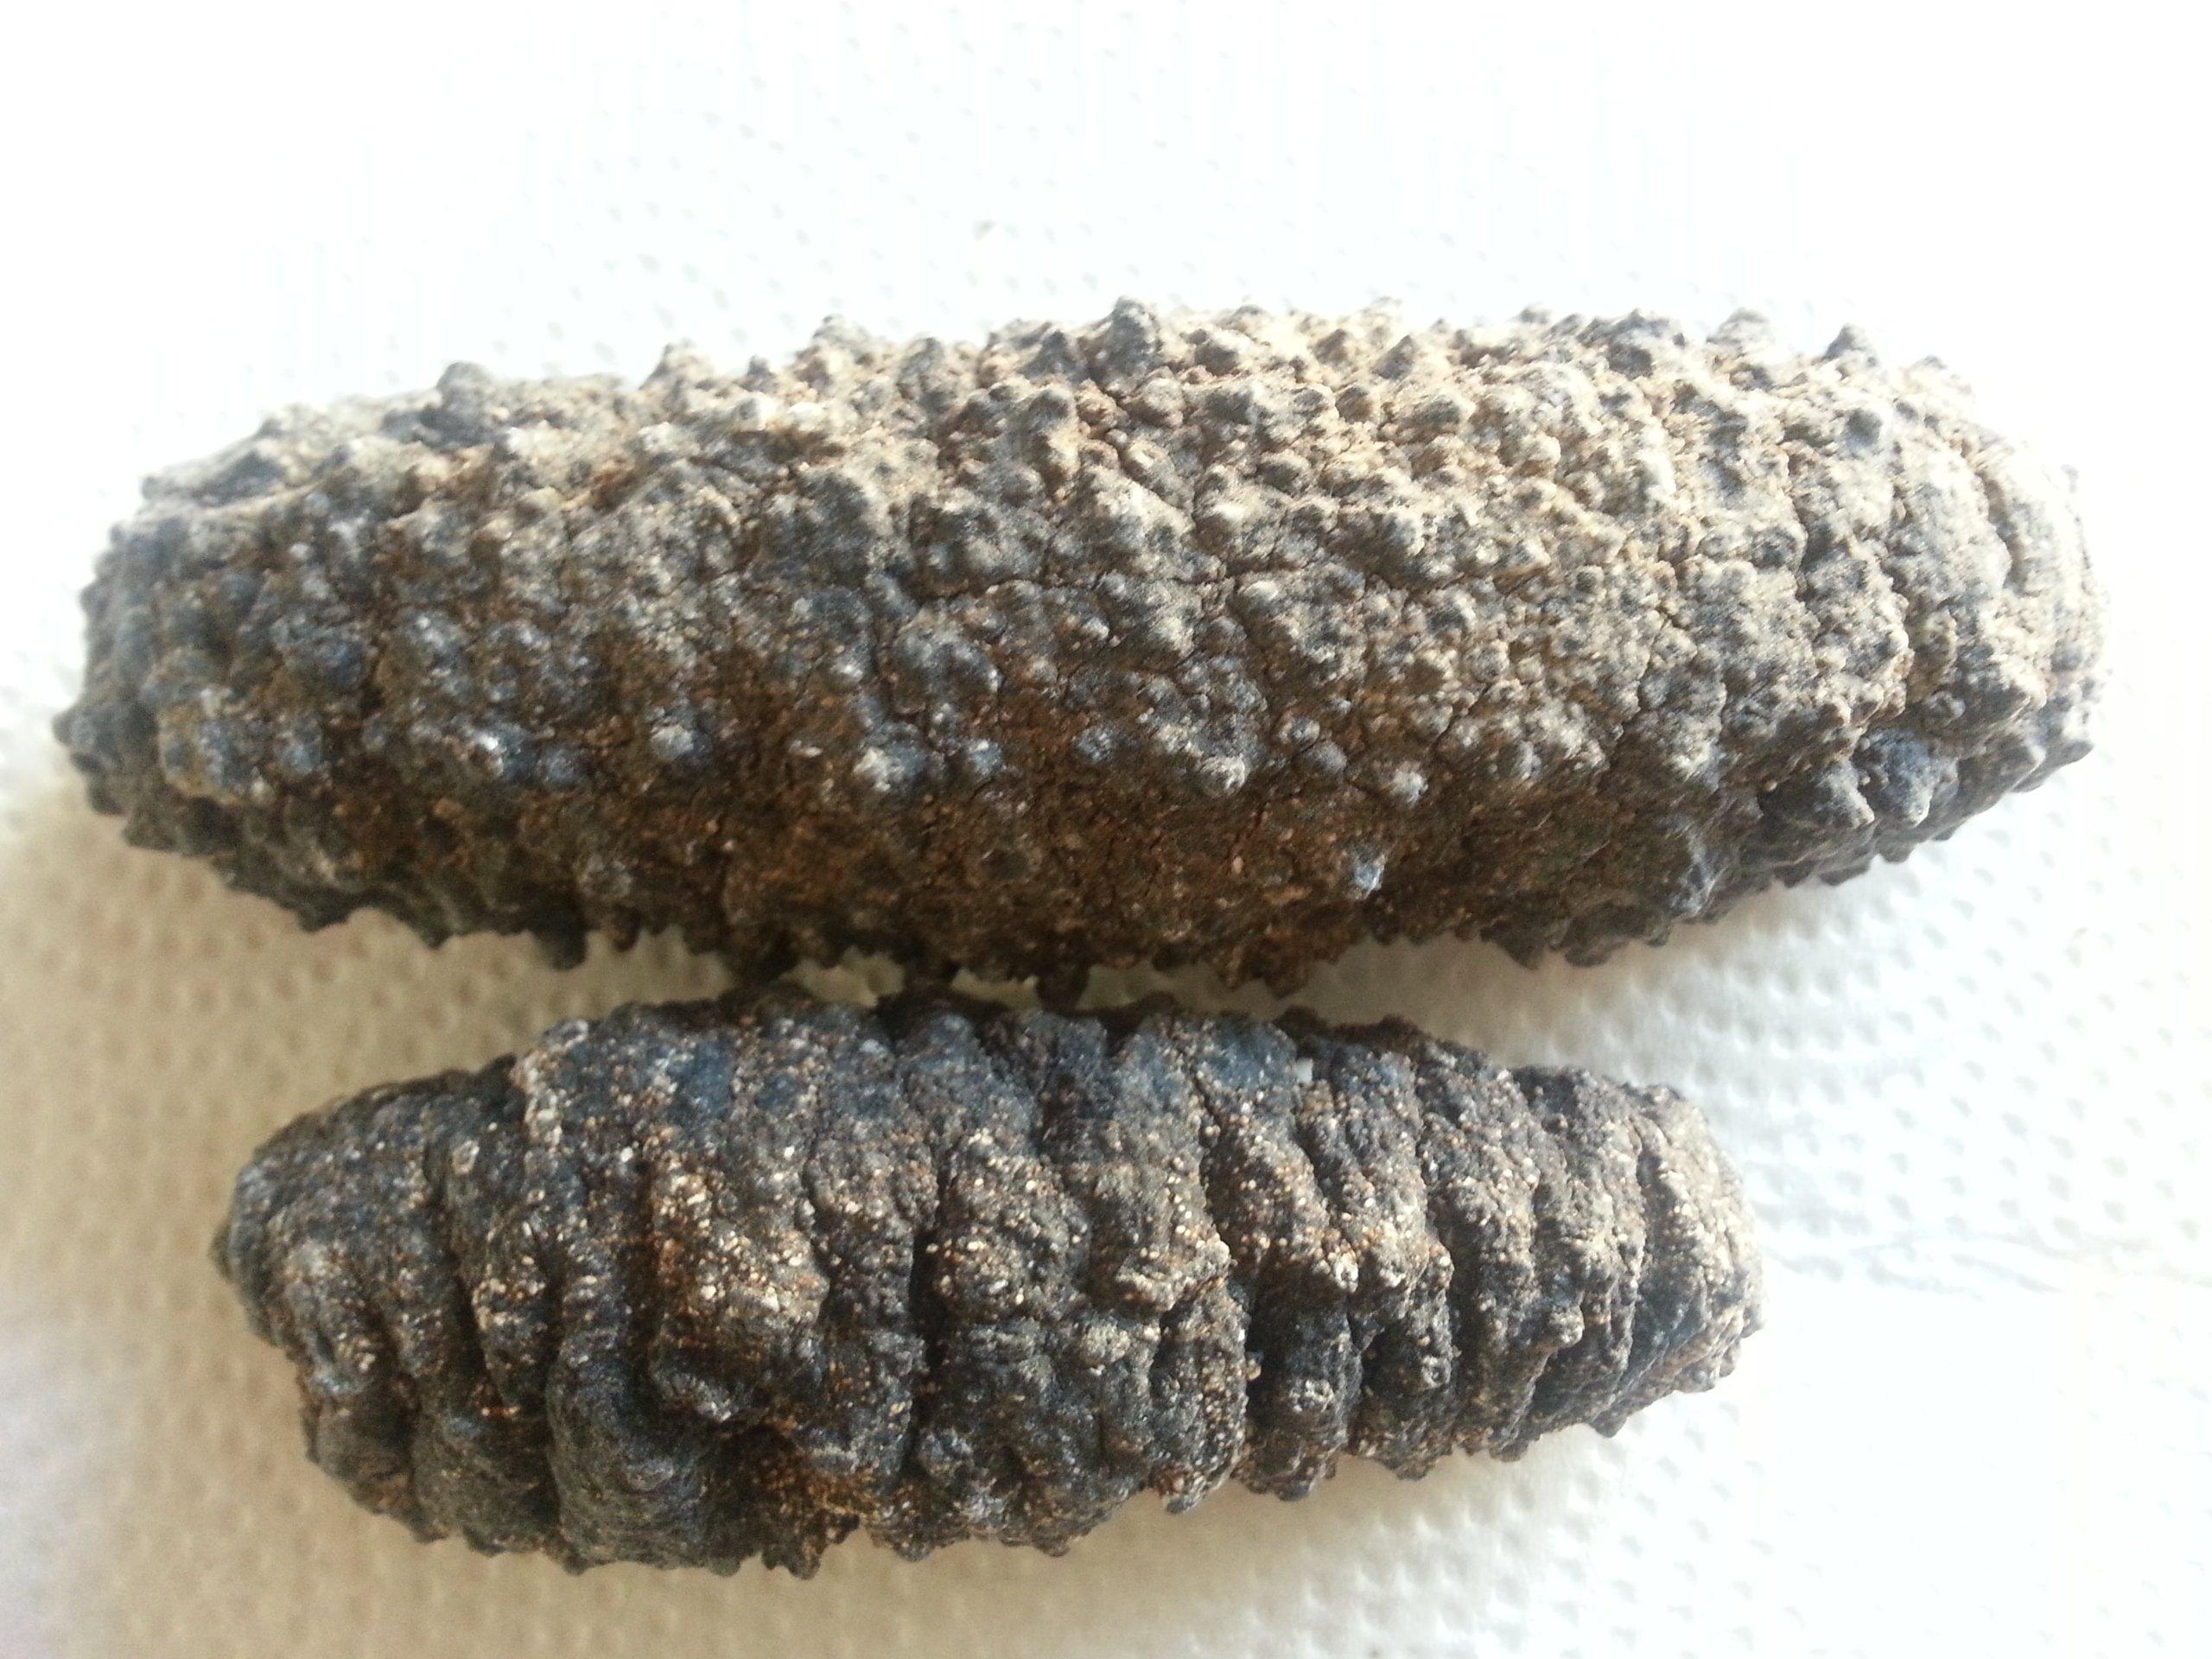 ERLIN Sea Cucumber Natural Sun Dried Badionotus Leechy 5 Pounds